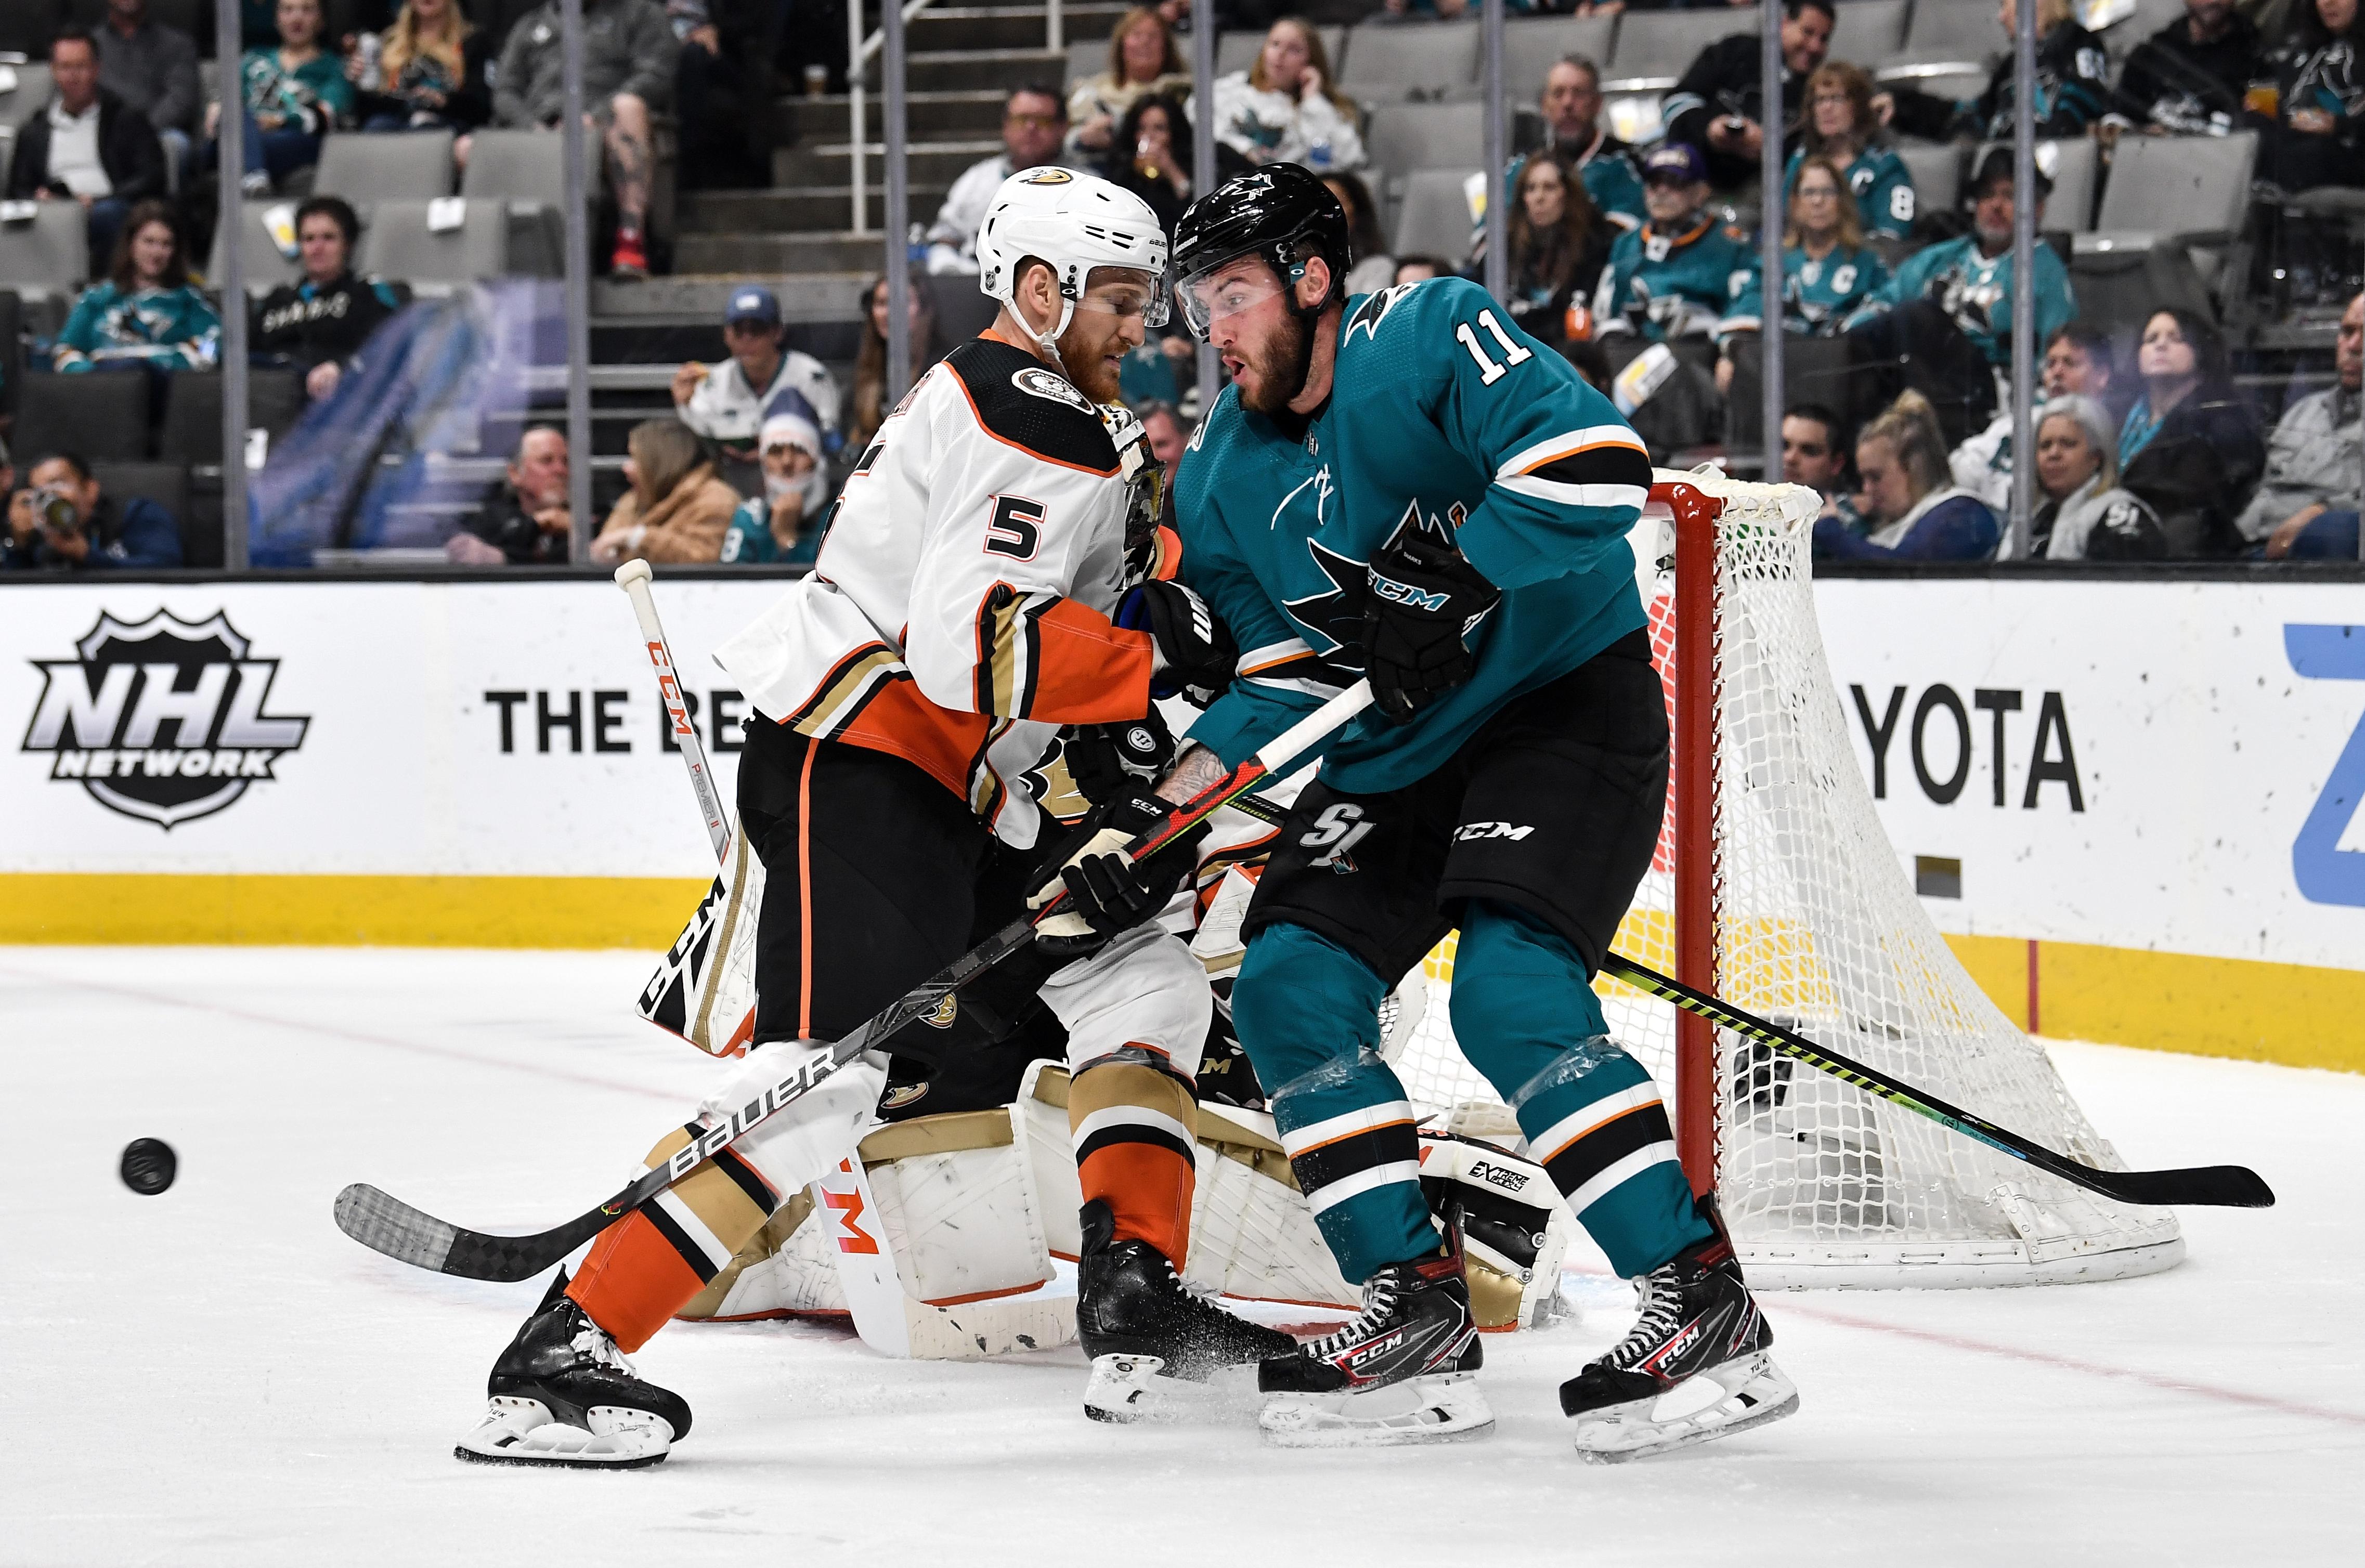 Stefan Noesen #11 of the San Jose Sharks battles for the puck against Korbinian Holzer #5 of the Anaheim Ducks at SAP Center on January 27, 2020 in San Jose, California